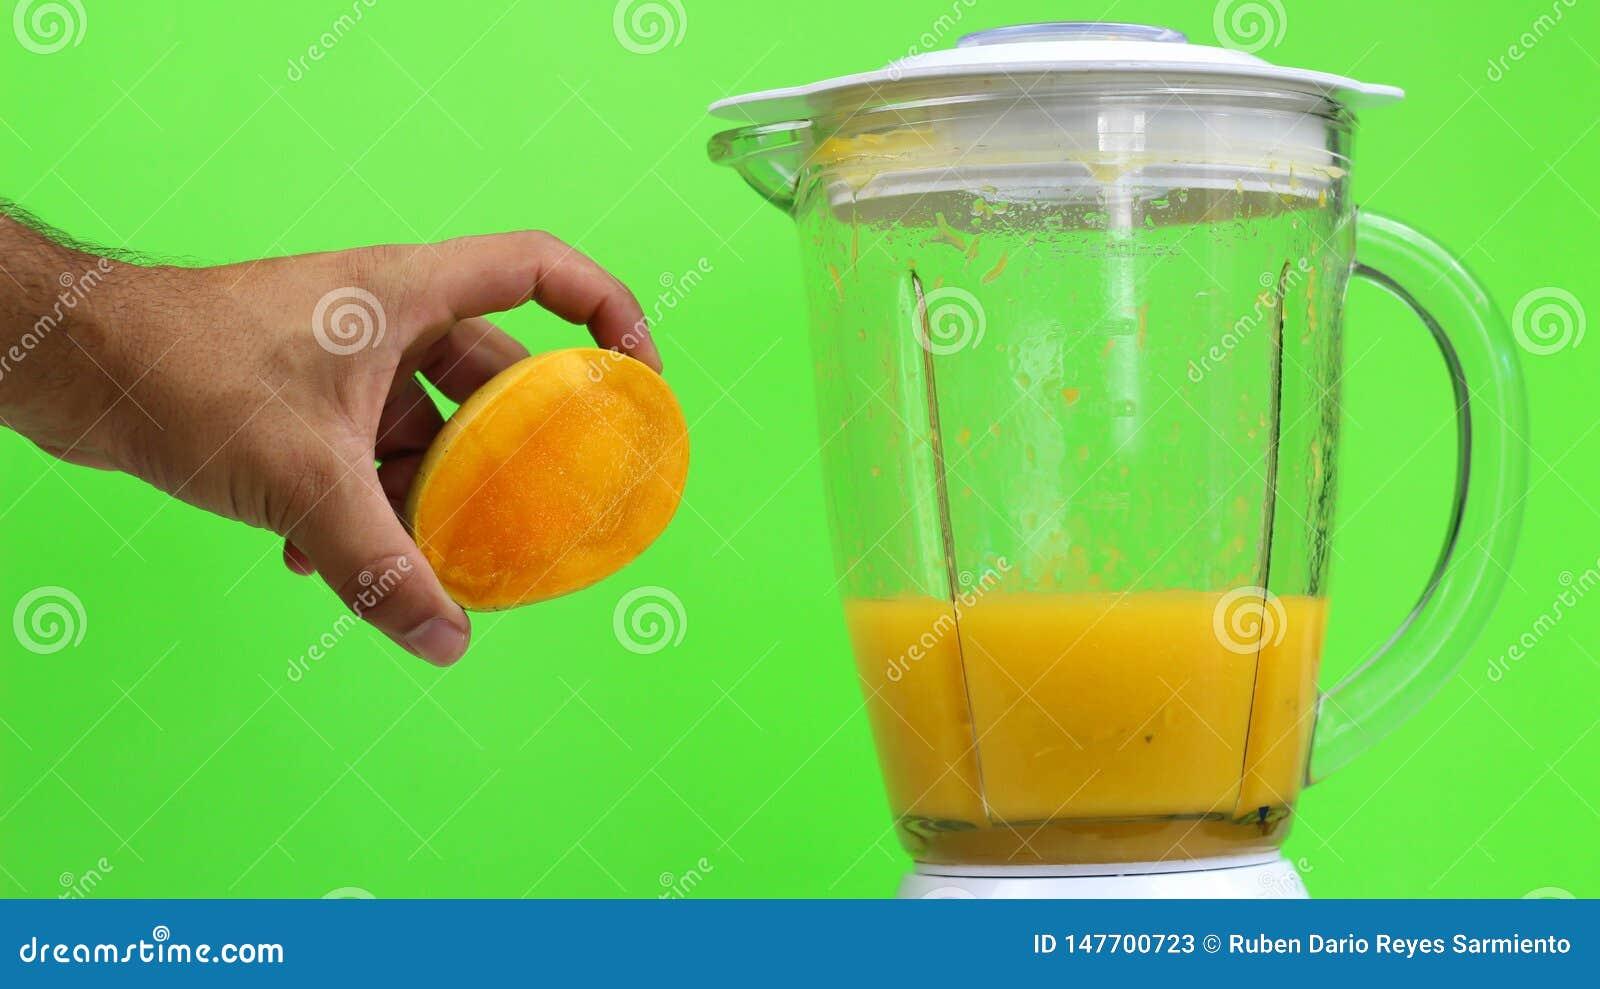 Mangowy sok z blender na zielonym tle,